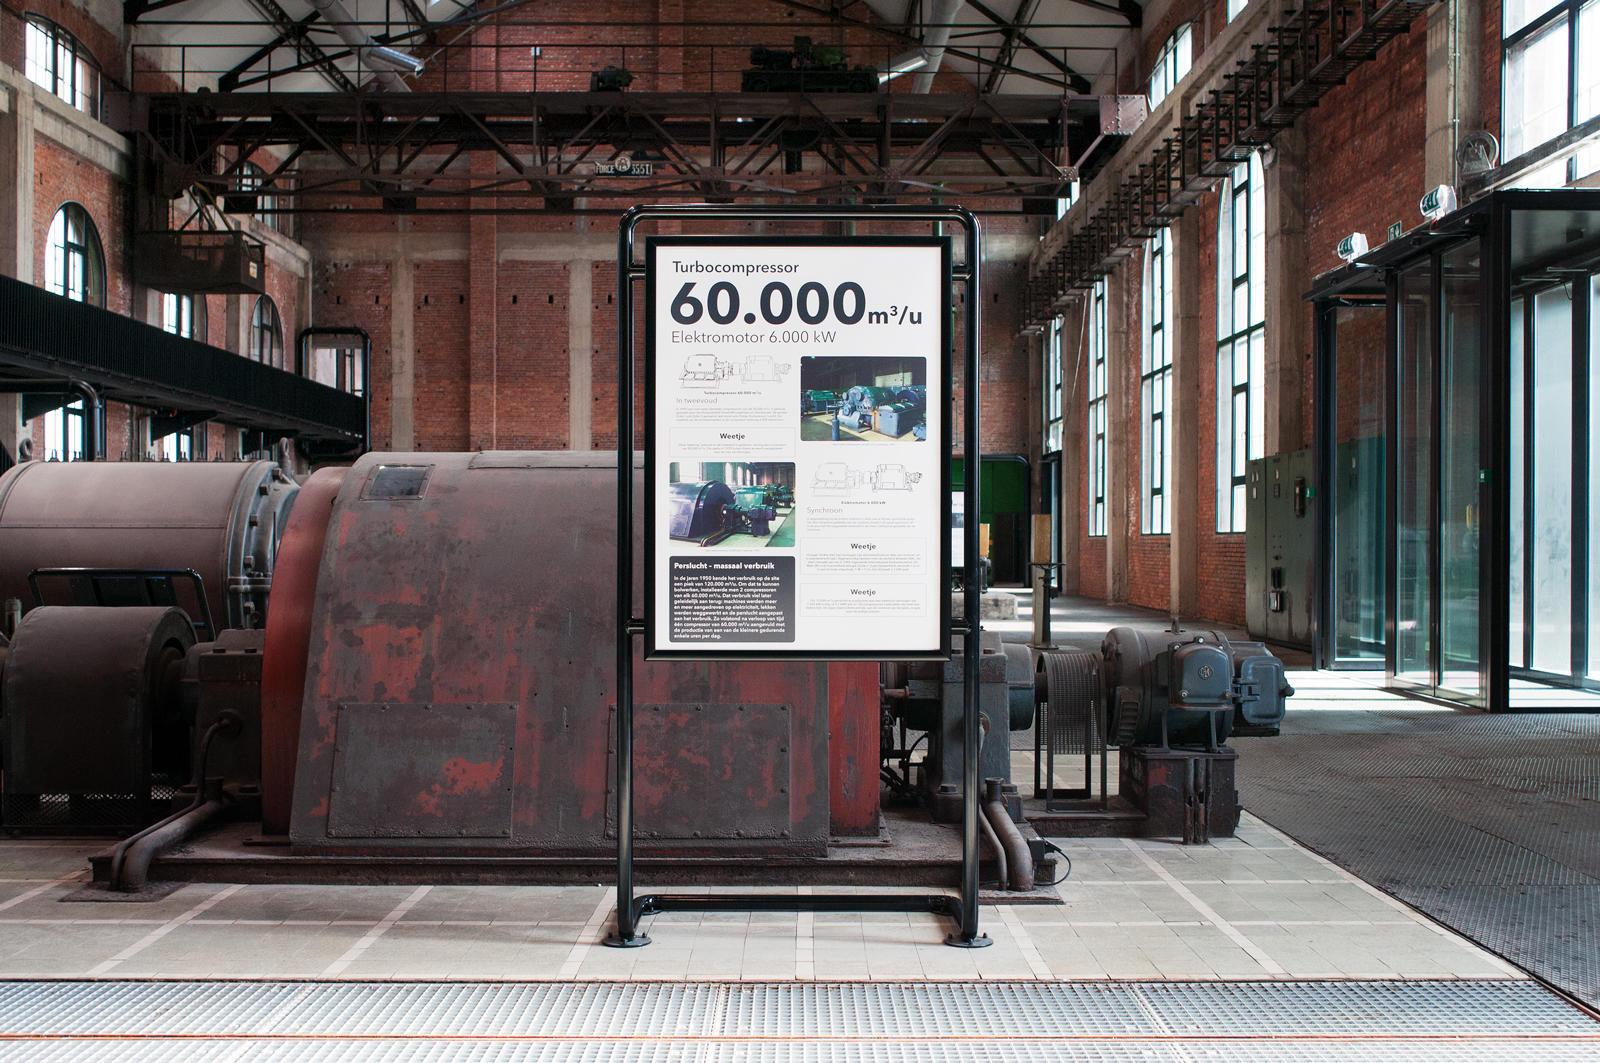 ZLDR Luchtfabriek - Turbocompressor